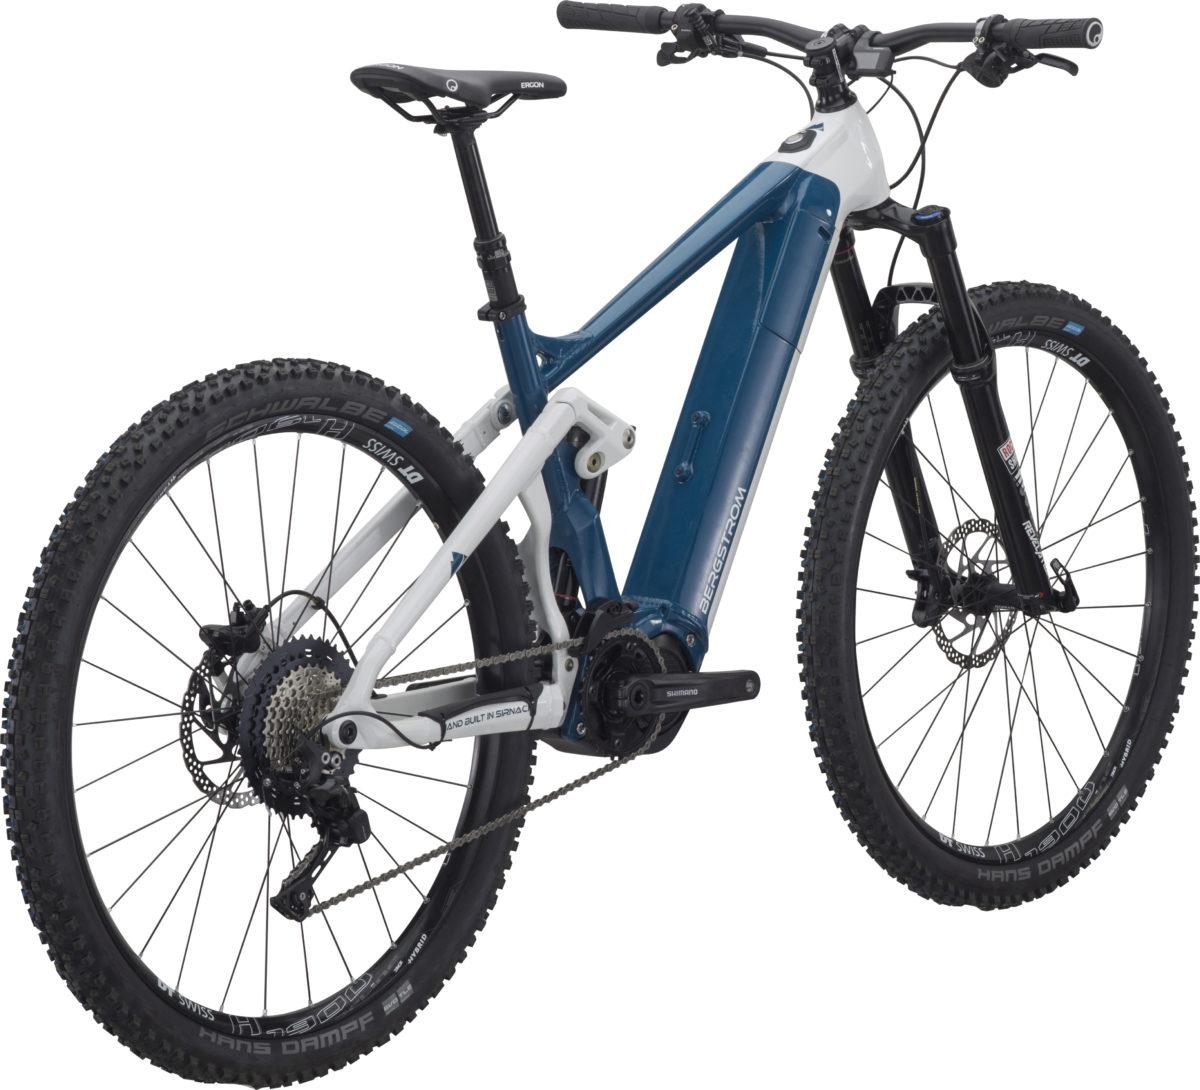 Bergstrom ATV 909 Serie